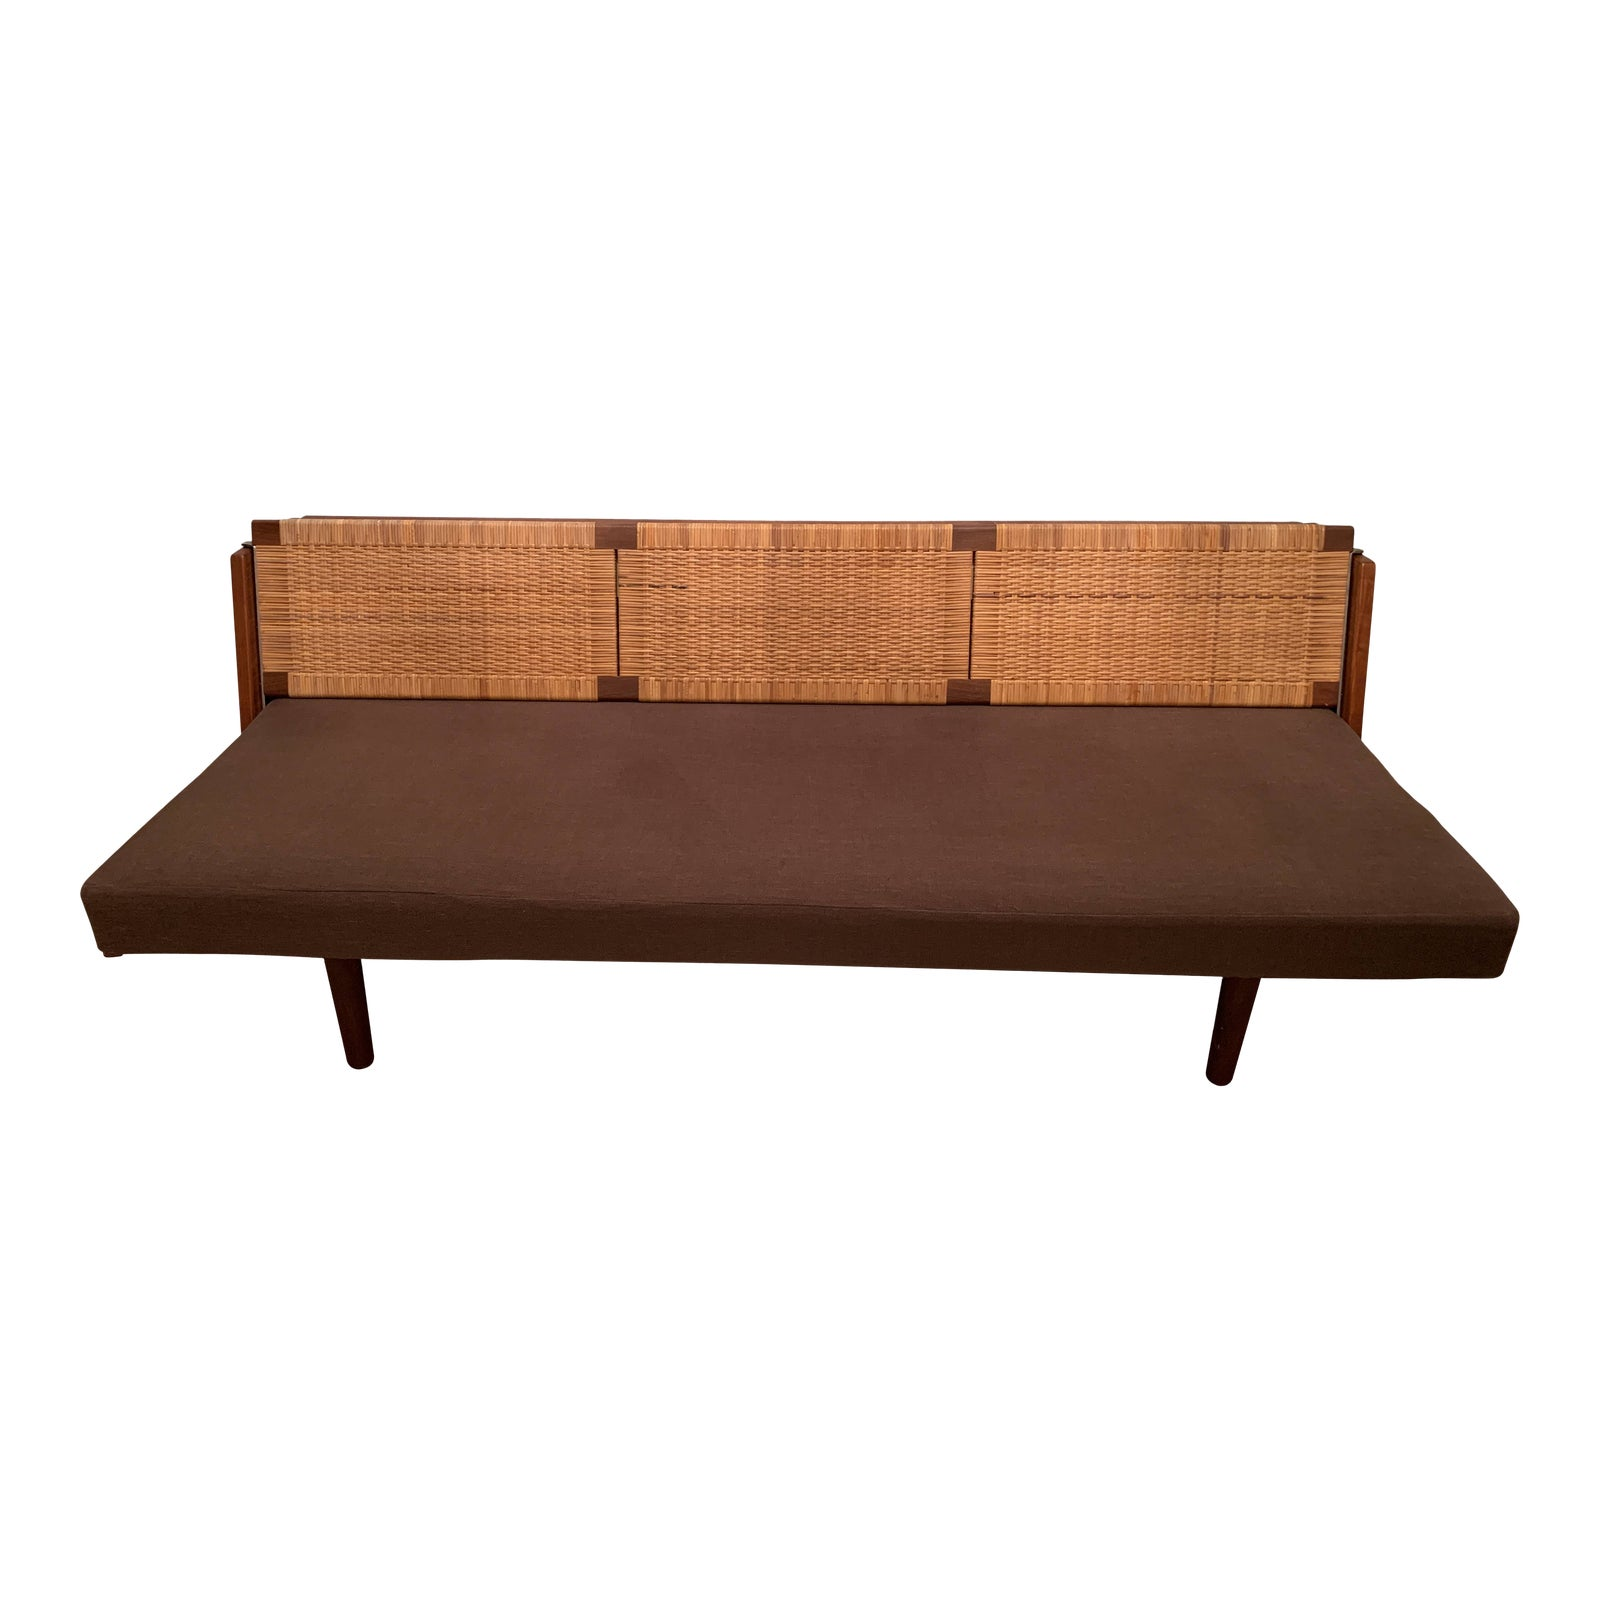 1950s-vintage-hans-wegner-for-getama-wood-and-rattan-daybed-3457